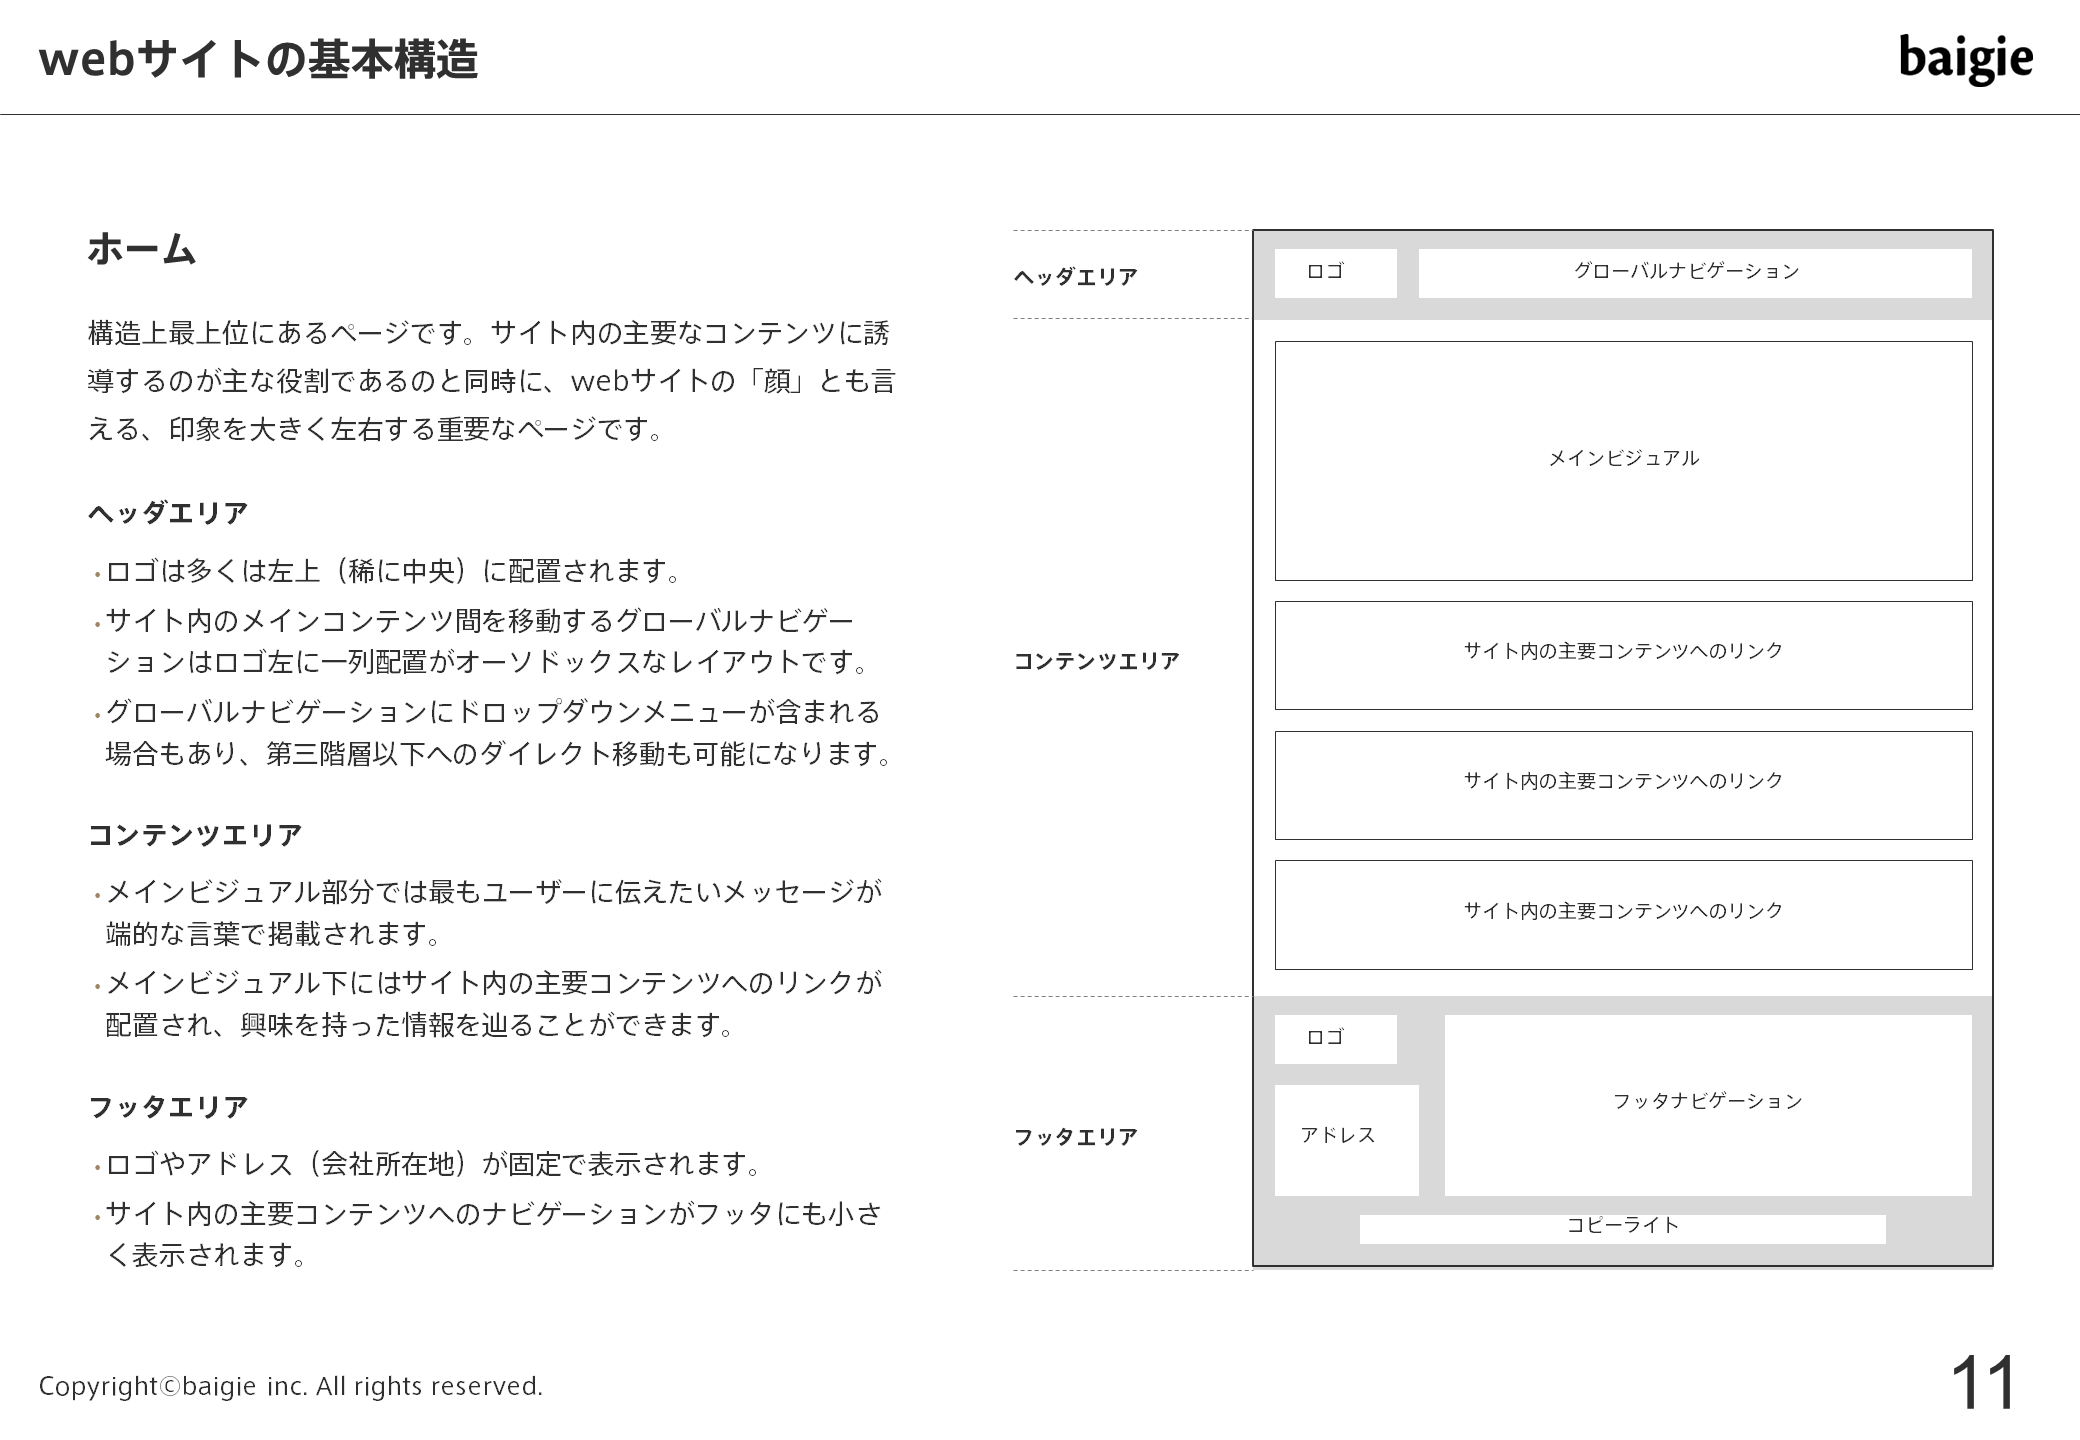 webサイトの基本構造